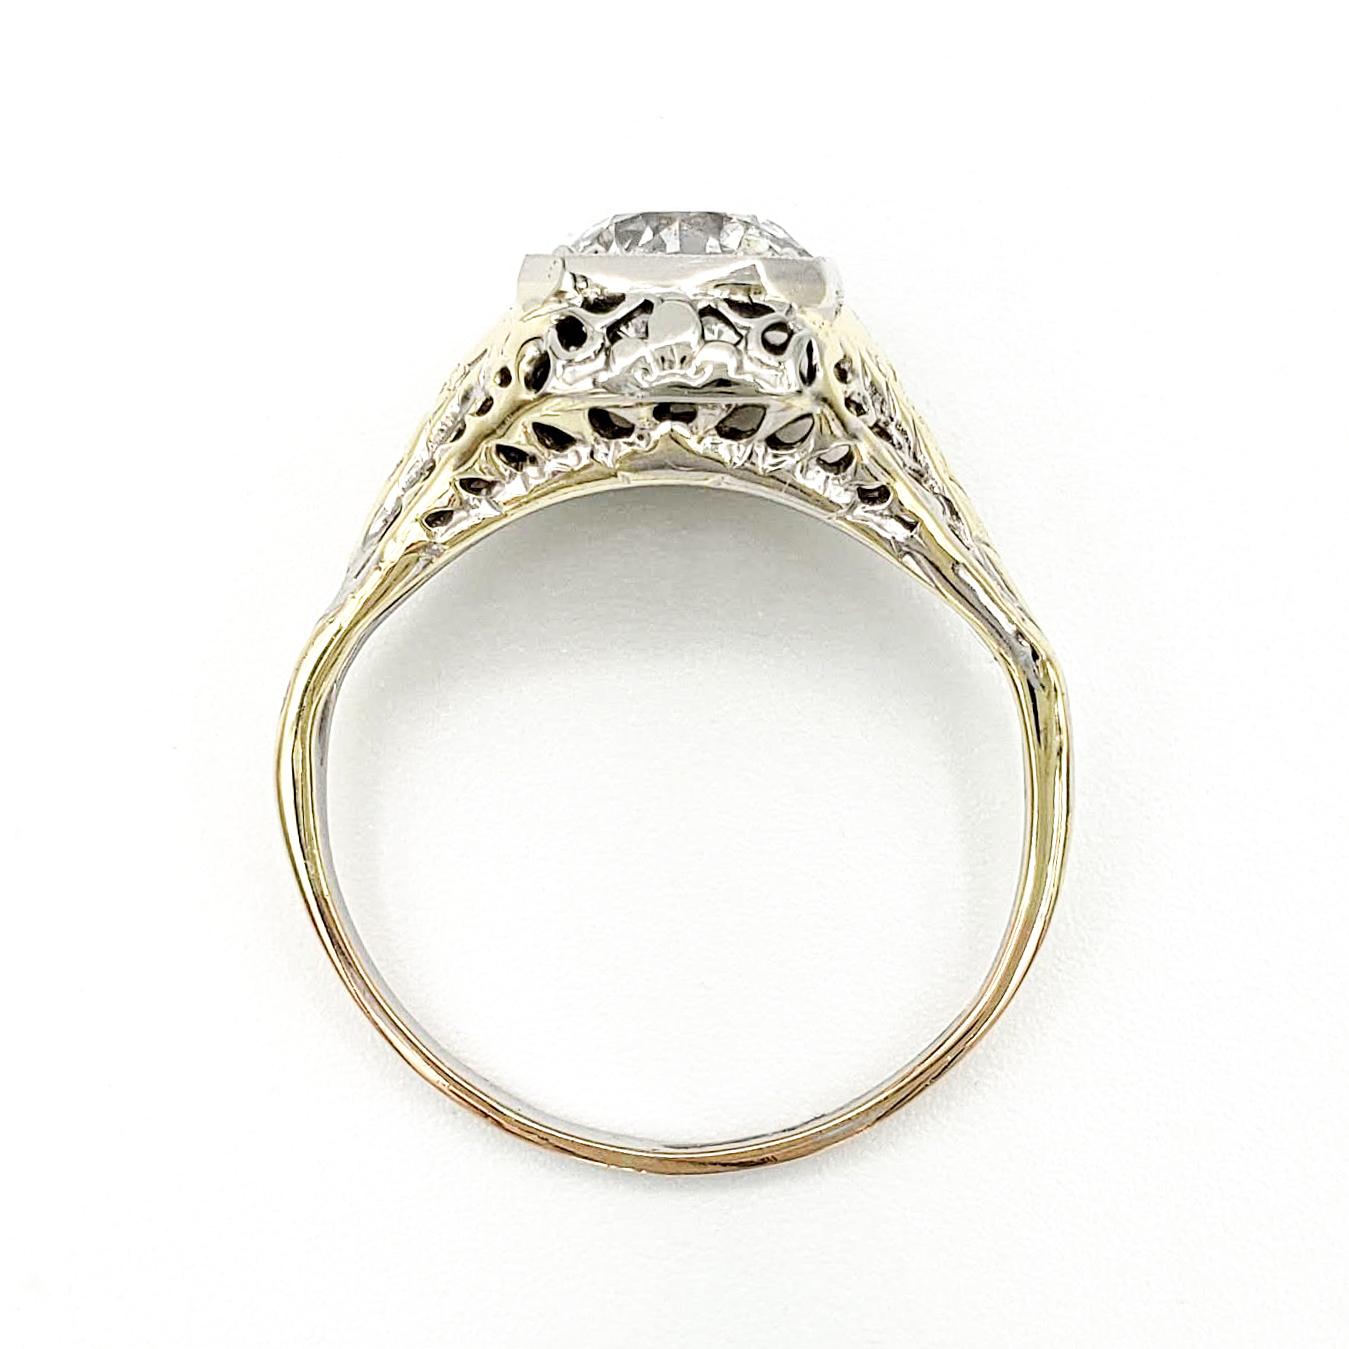 vintage-14-karat-engagement-ring-with-1-15-carat-old-european-cut-diamond-egl-f-si3